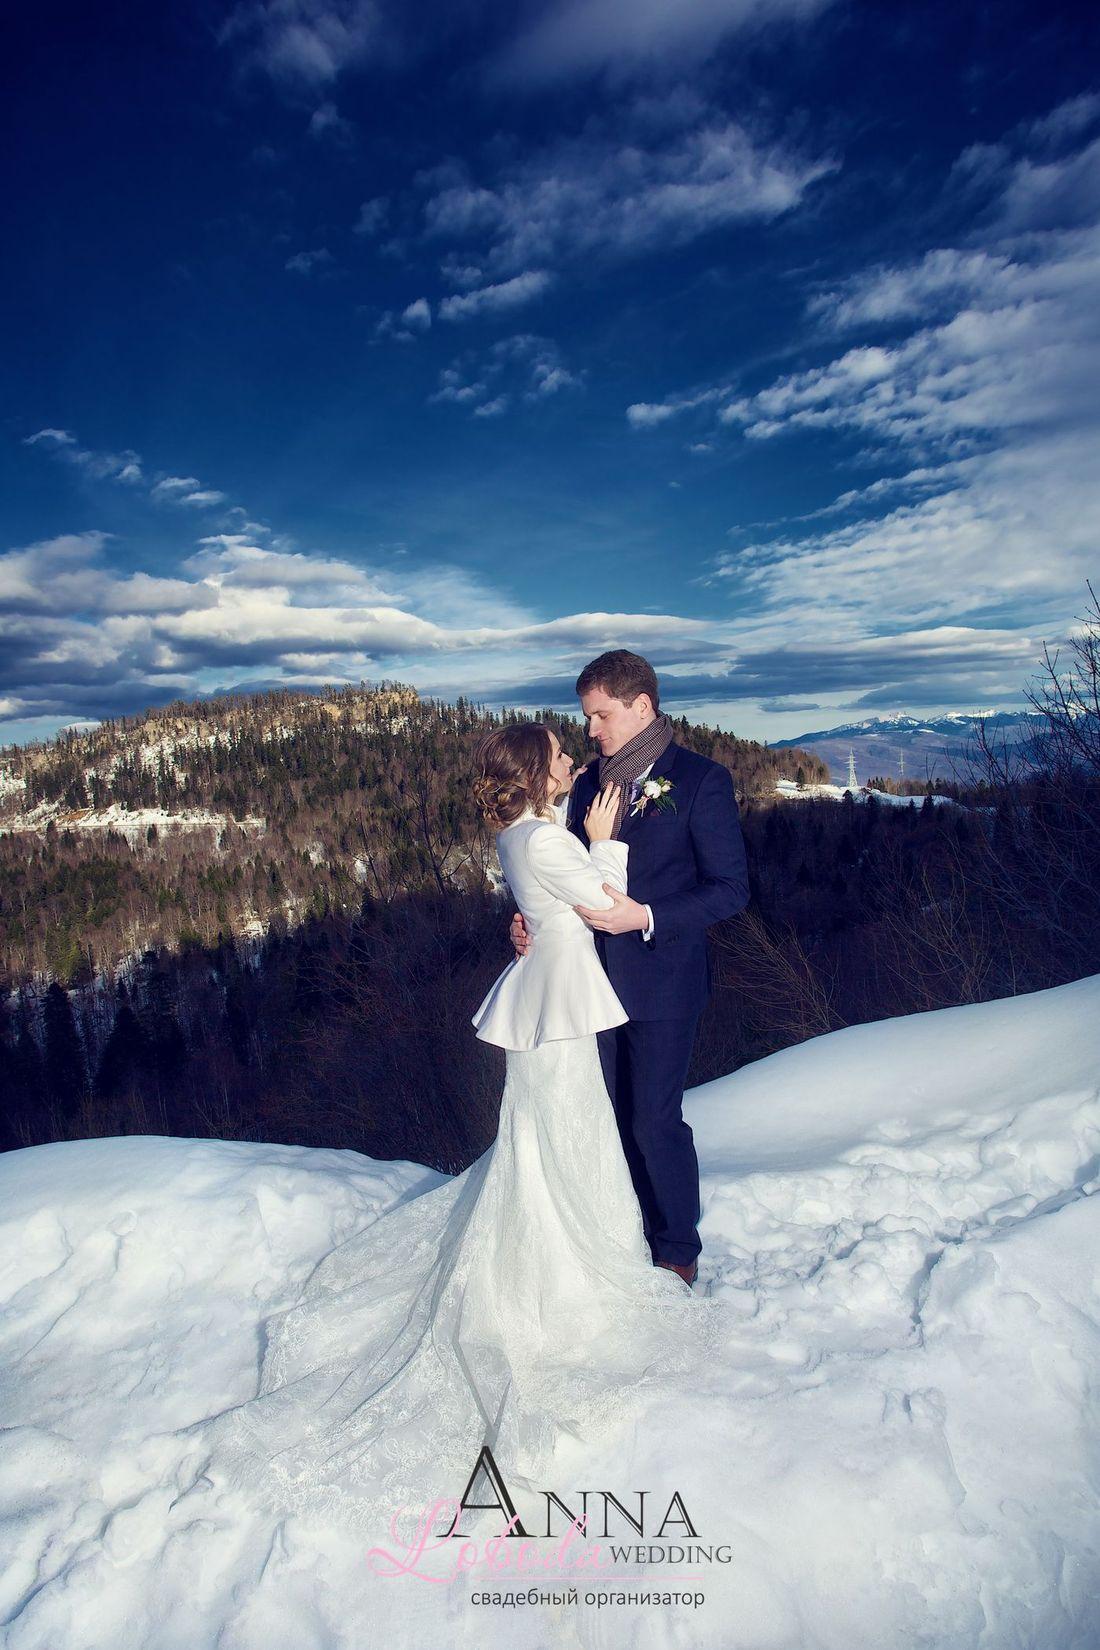 Фото свадьбы александра легкова